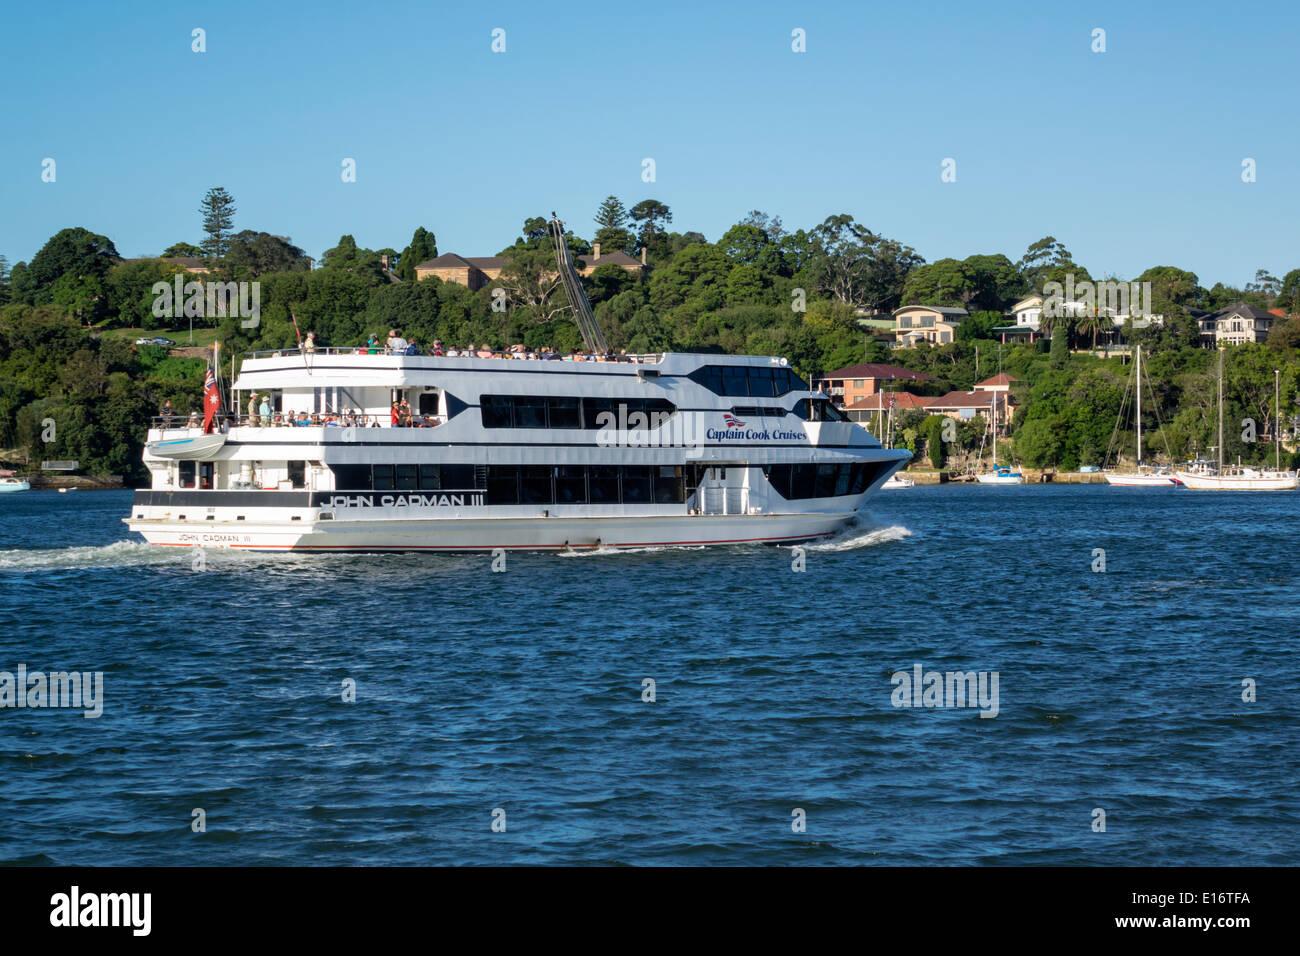 Captain Cook Bay Boat Tour